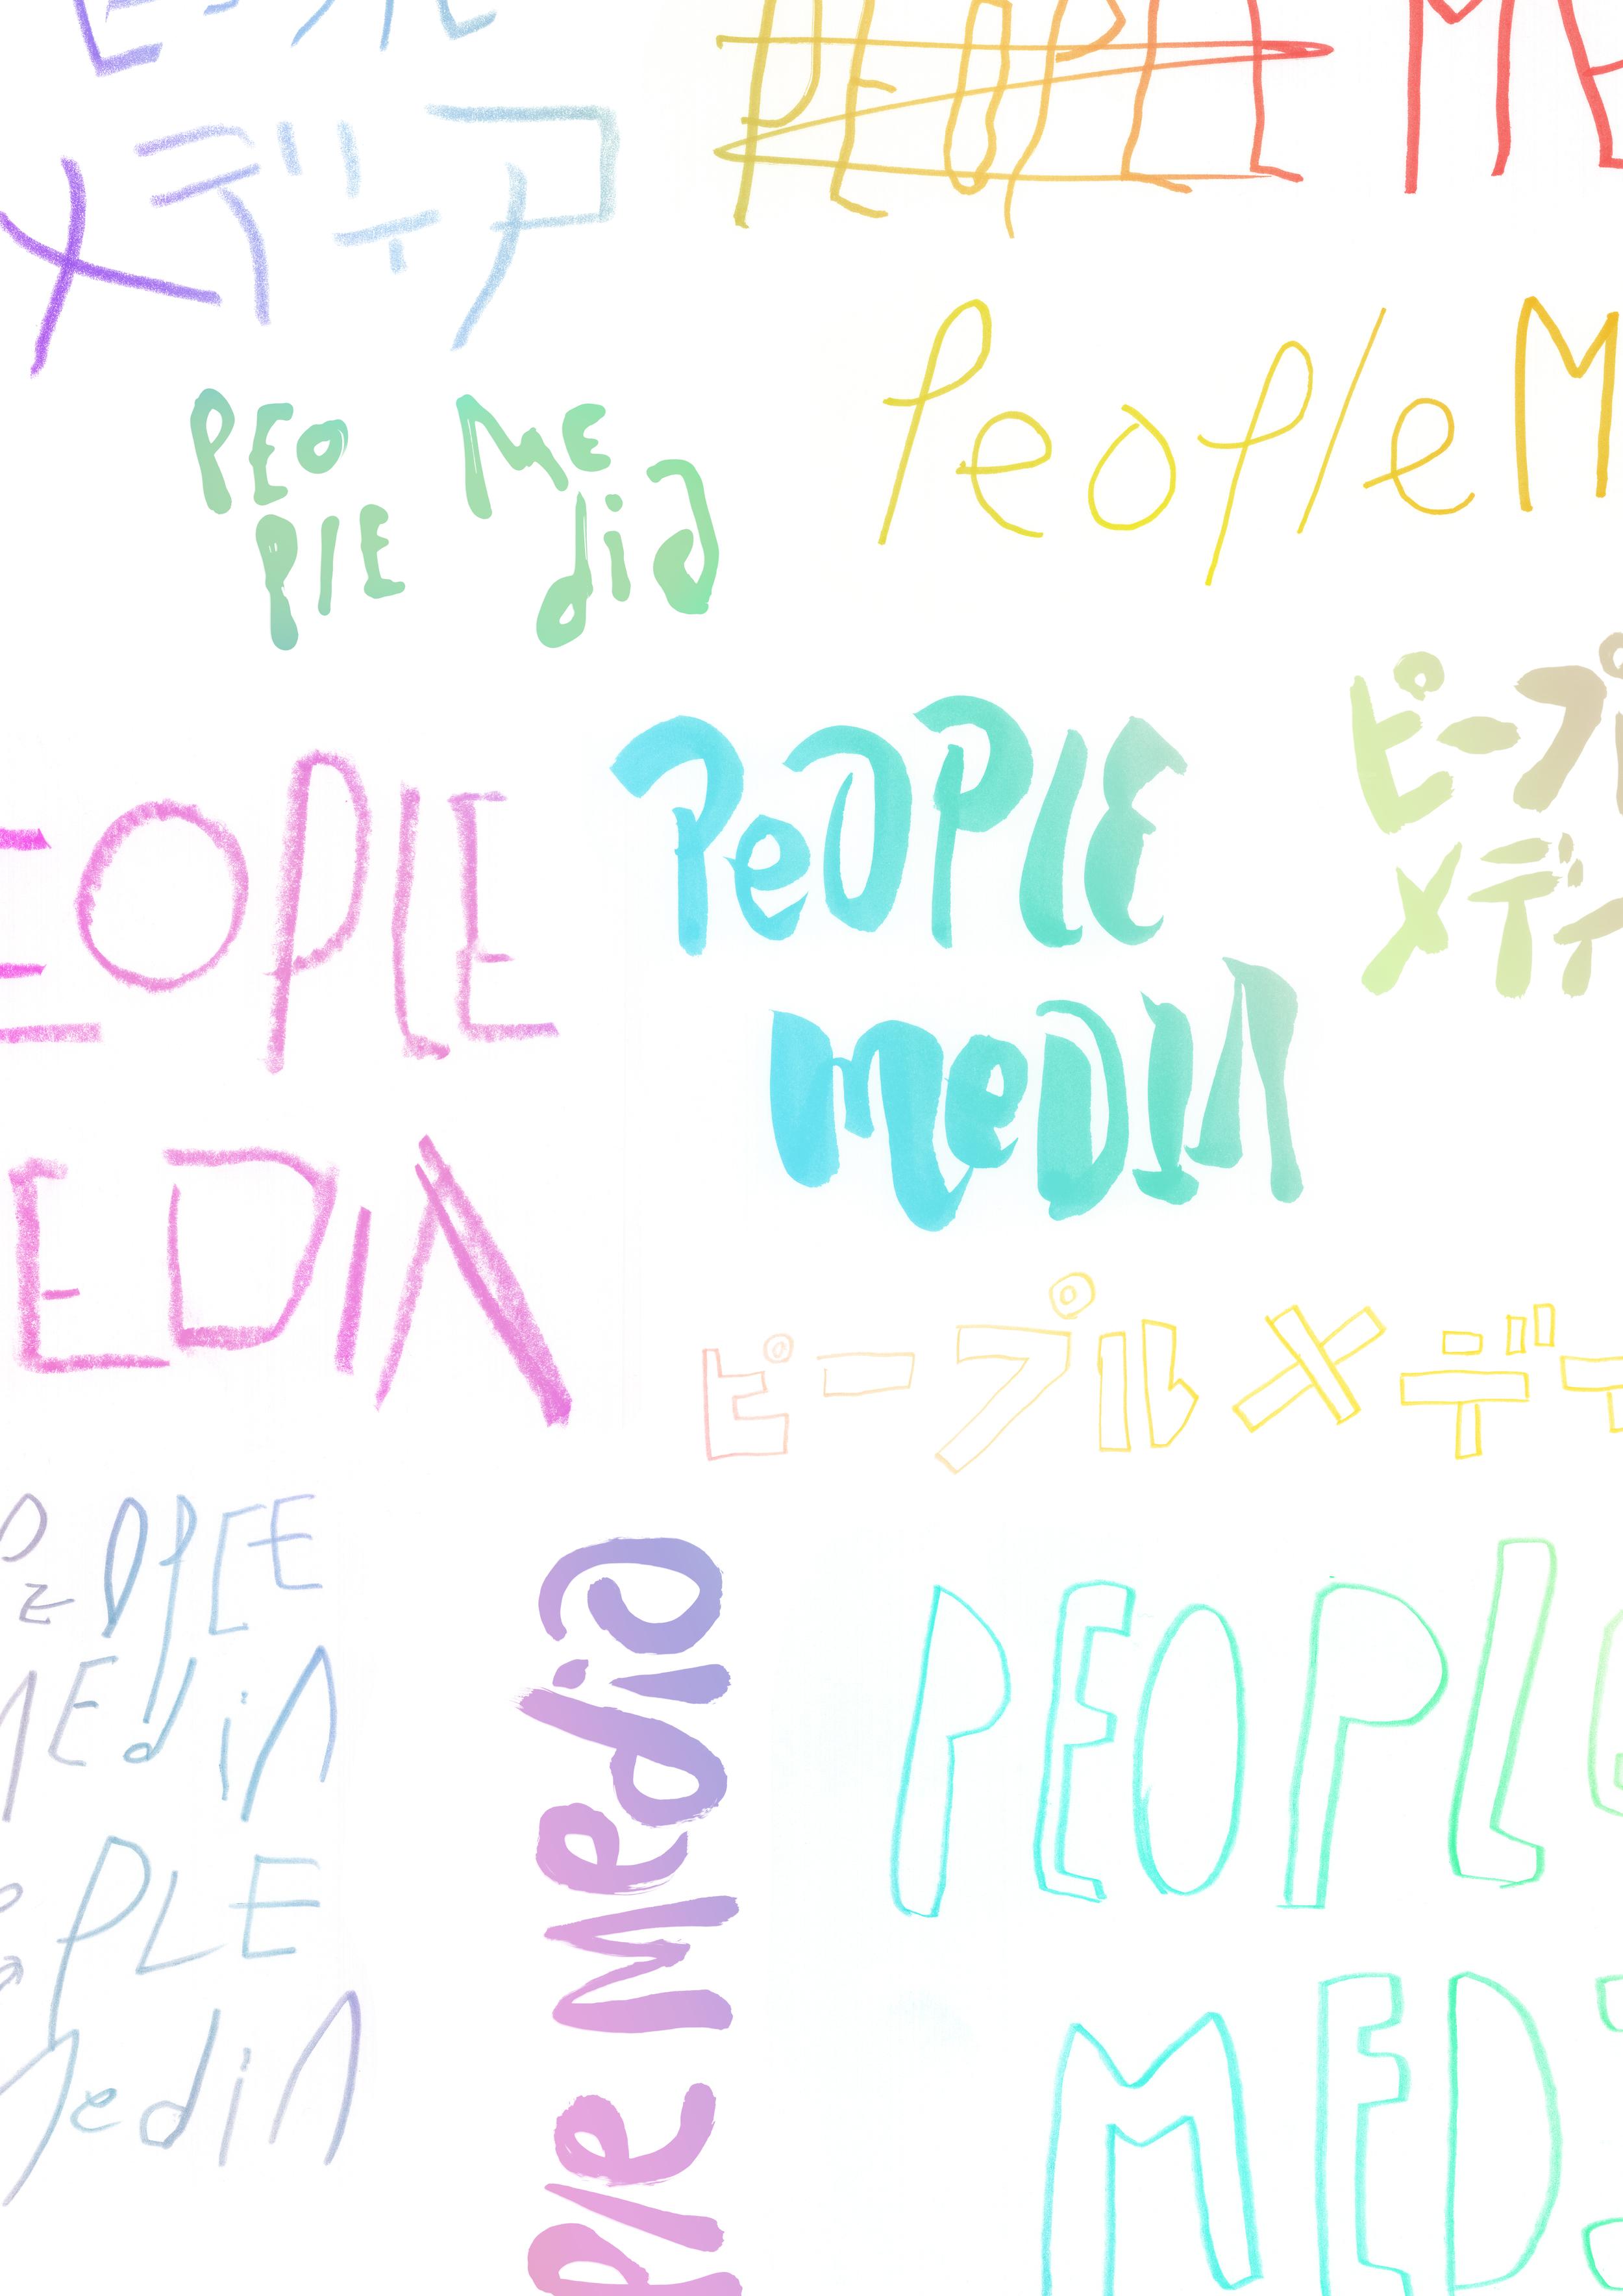 1603015_PeopleMedia_collage_B_T_normal.jpg